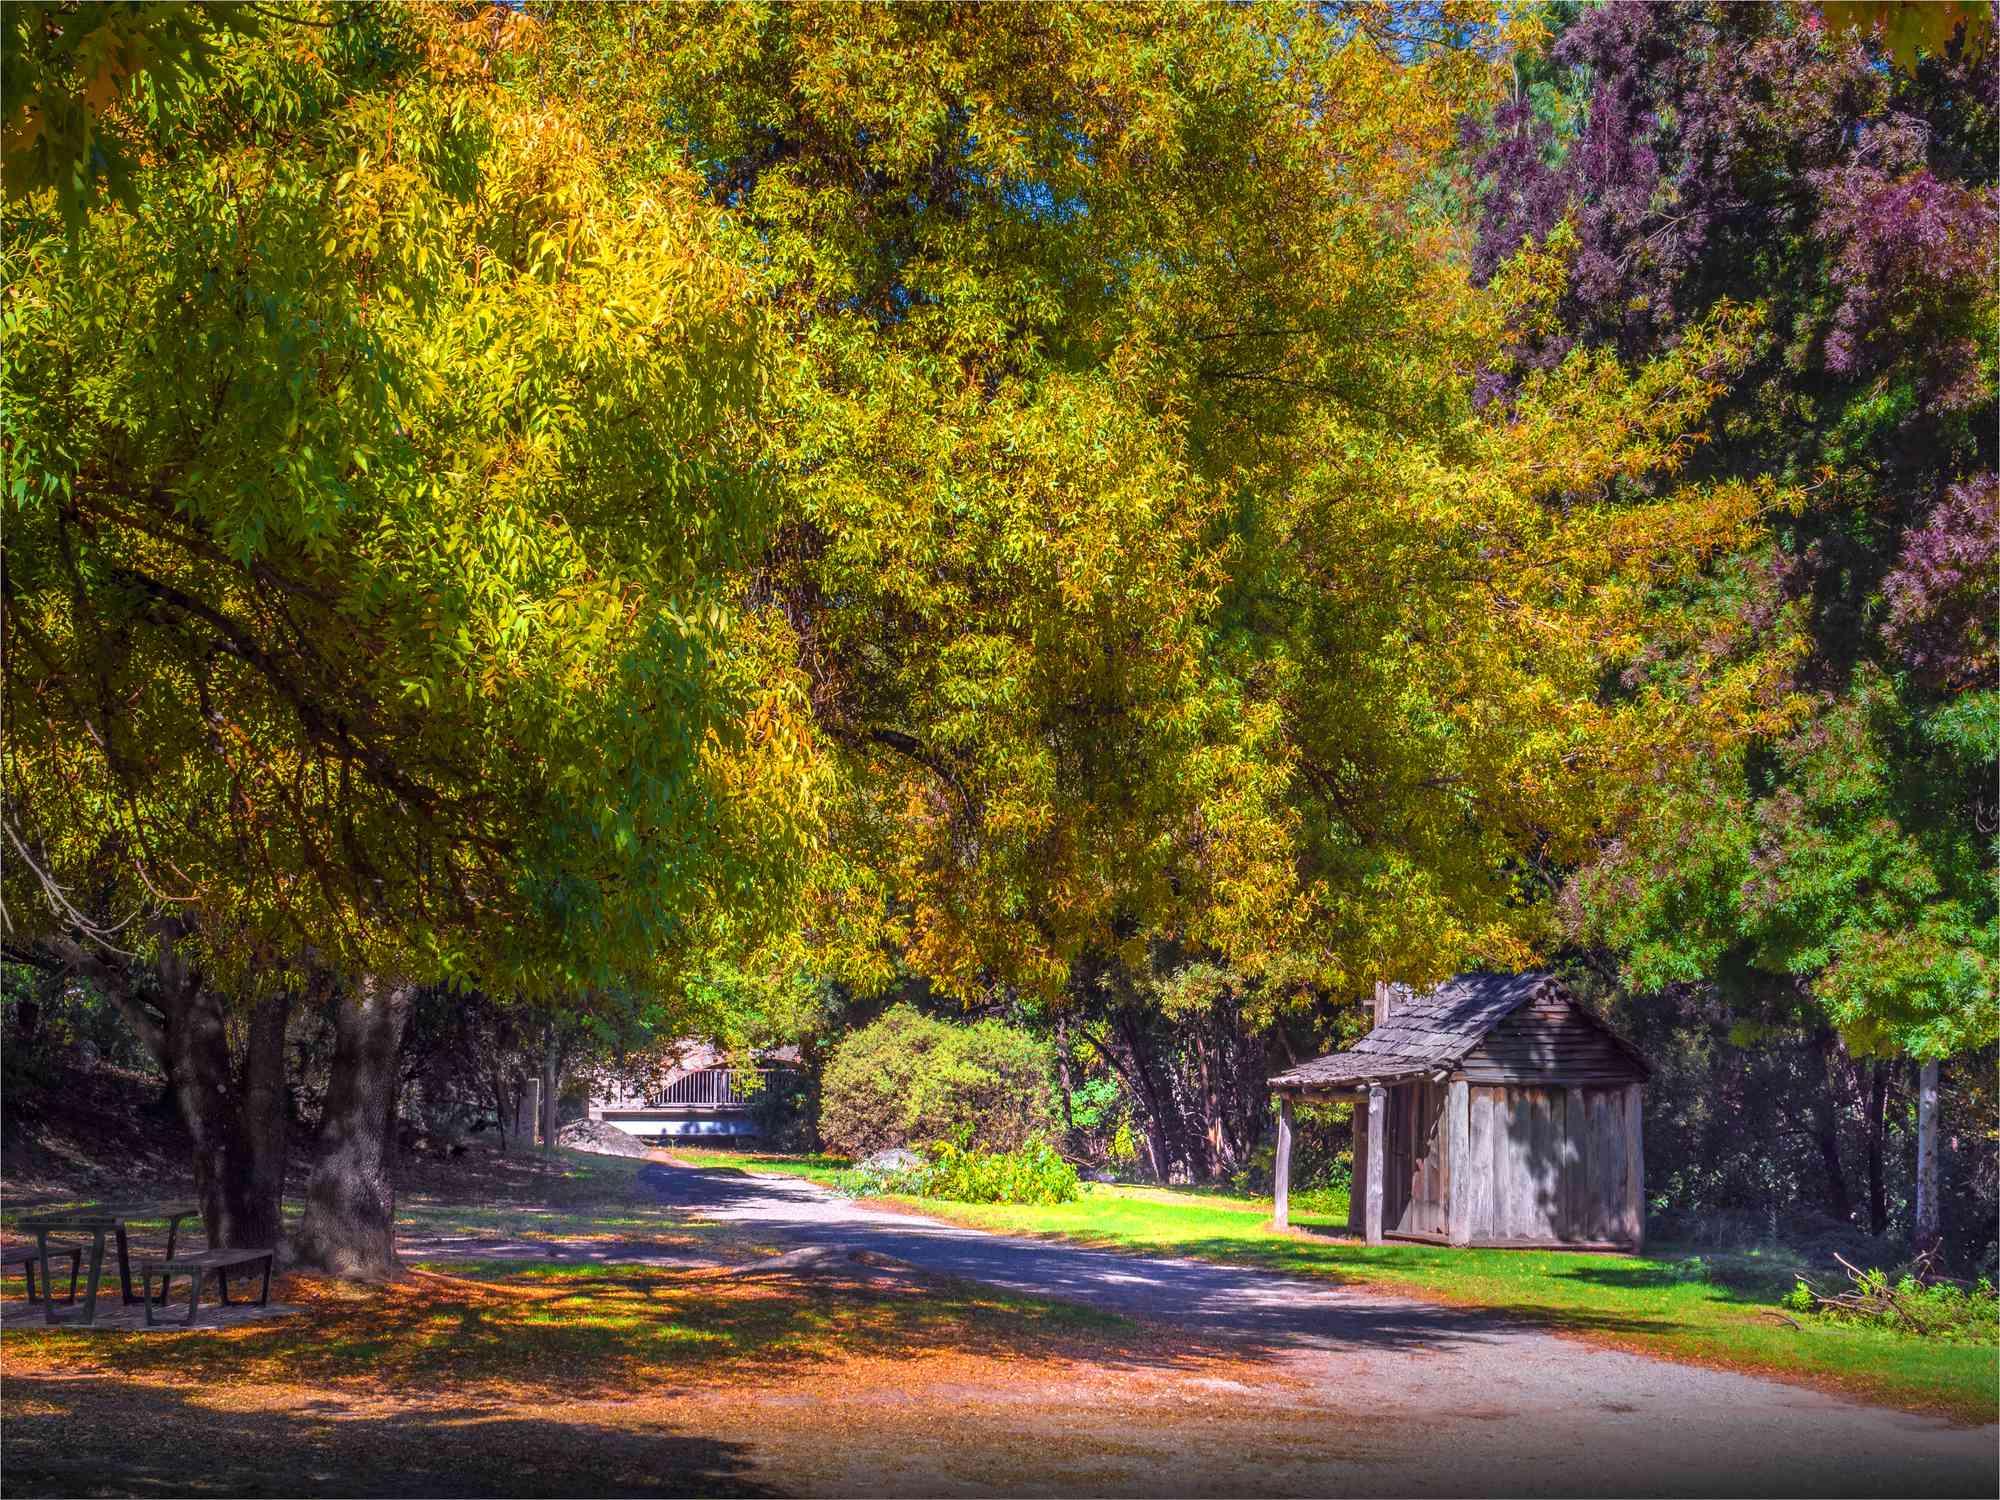 Quiet park in the town of Yackandandah, Australia